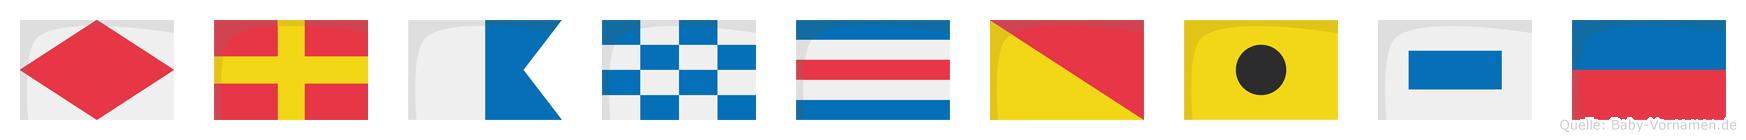 Francoise im Flaggenalphabet